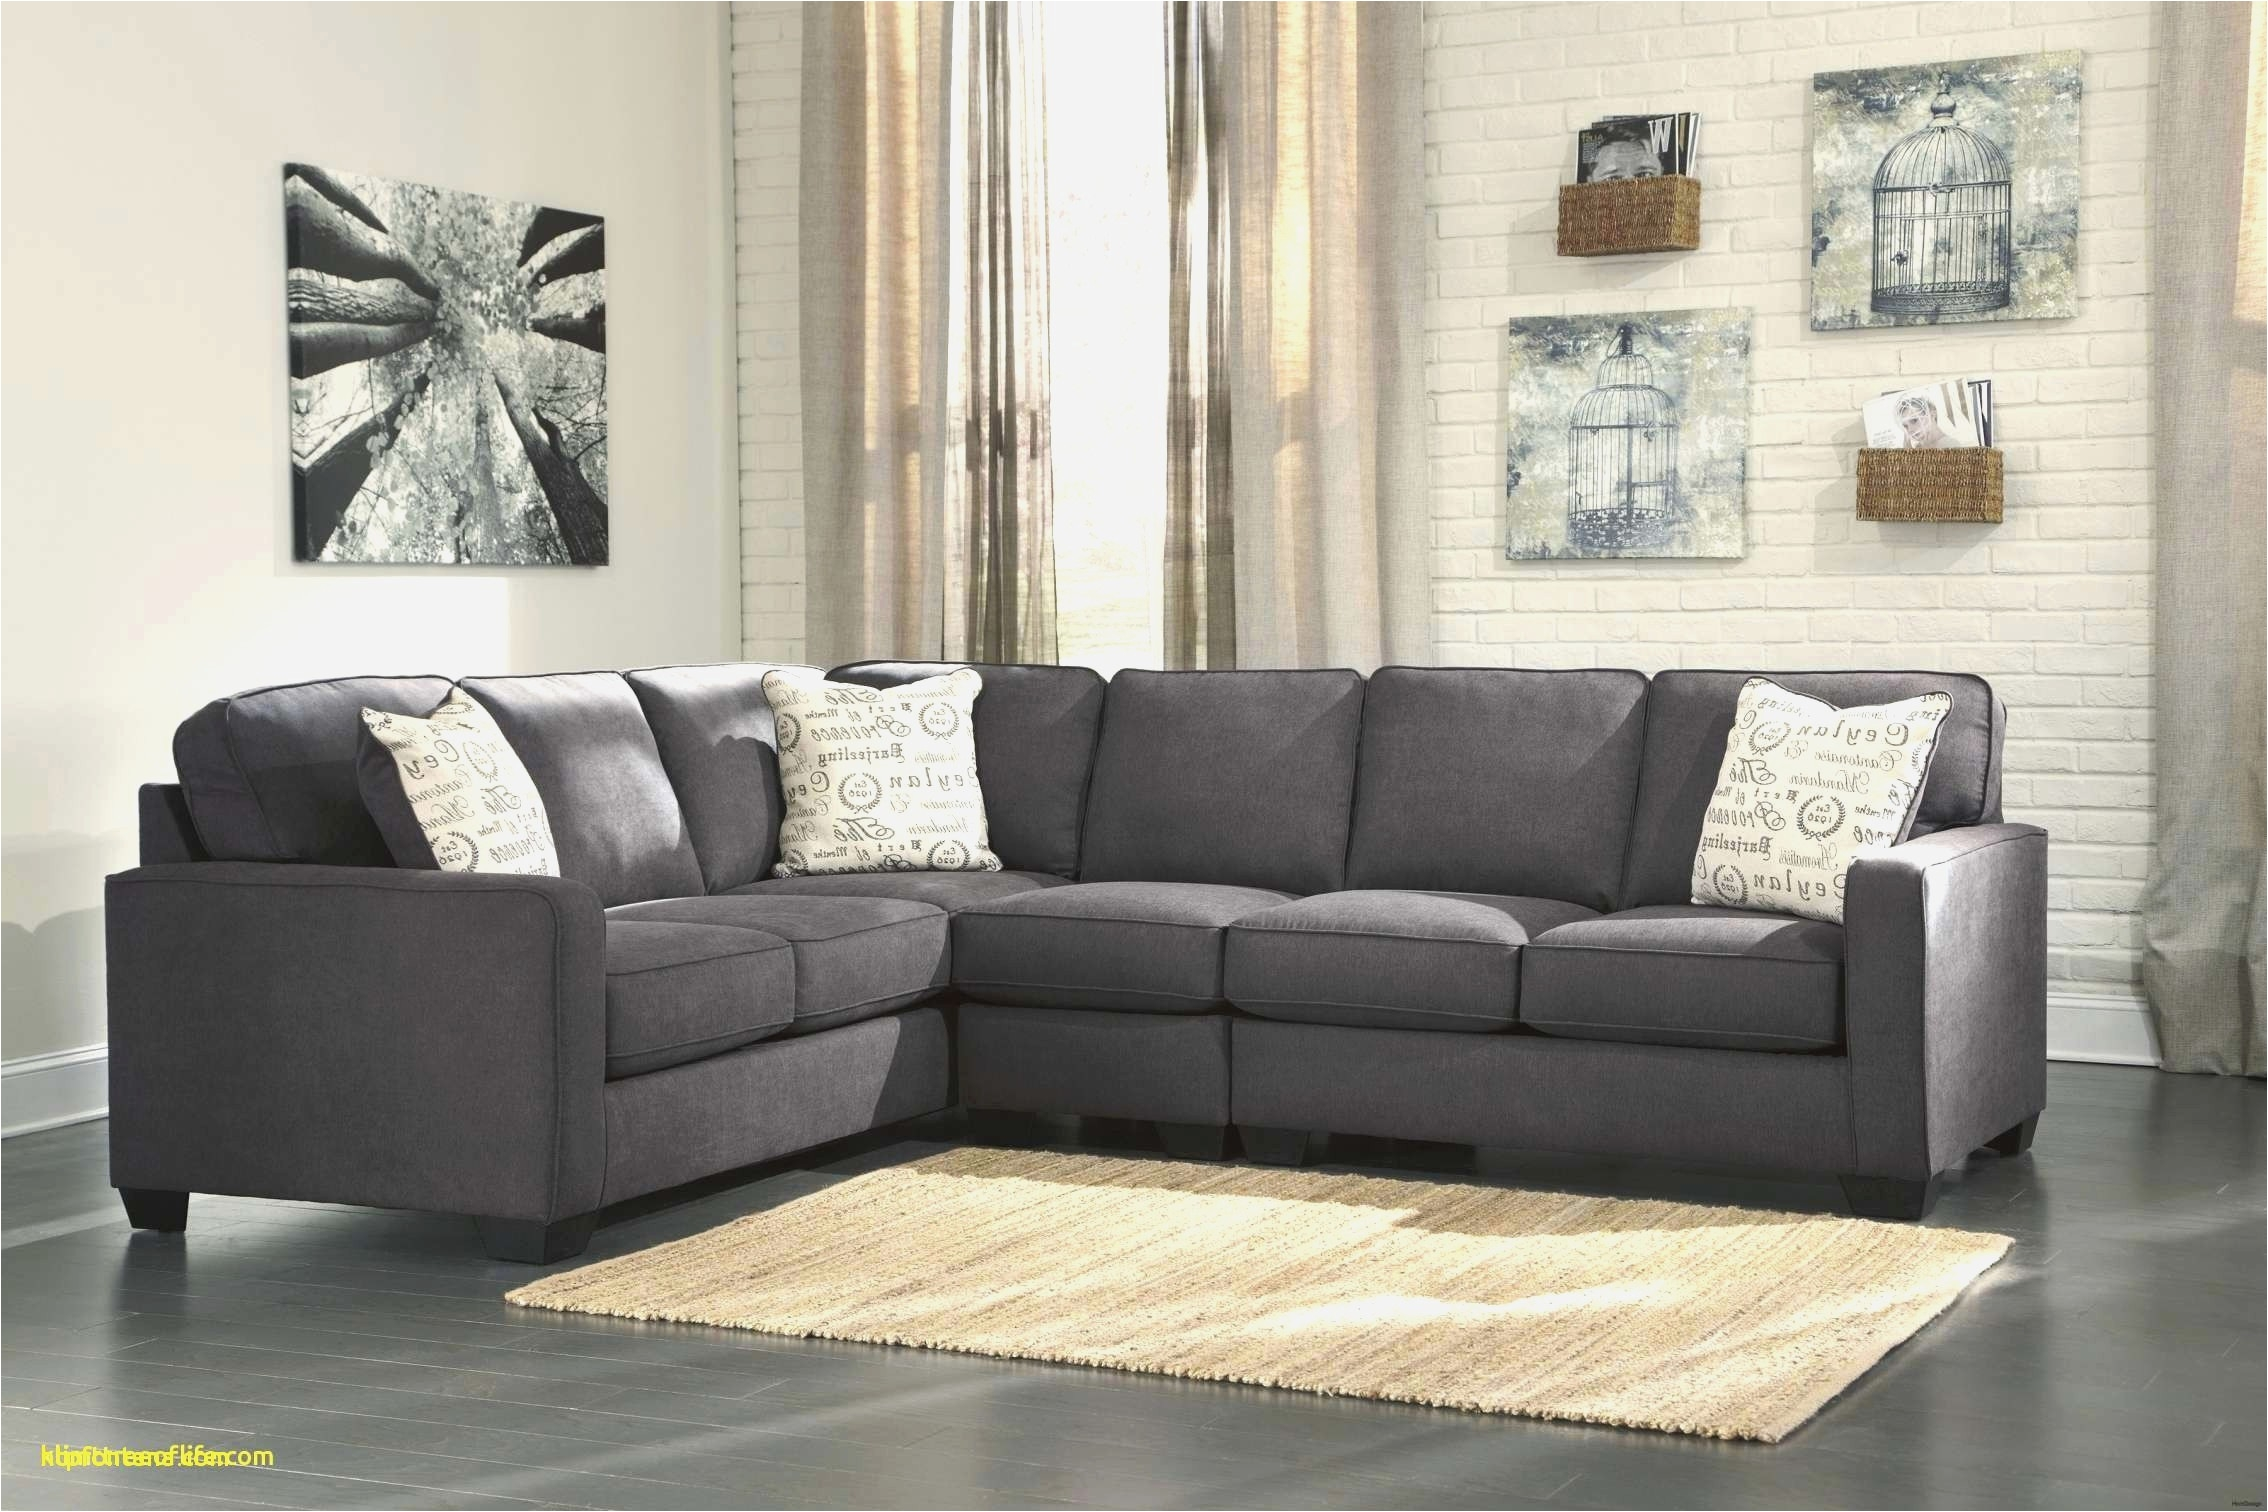 mor furniture for less phoenix az inspirational 33 beautiful ashley sofa furniture home furniture ideas gallery